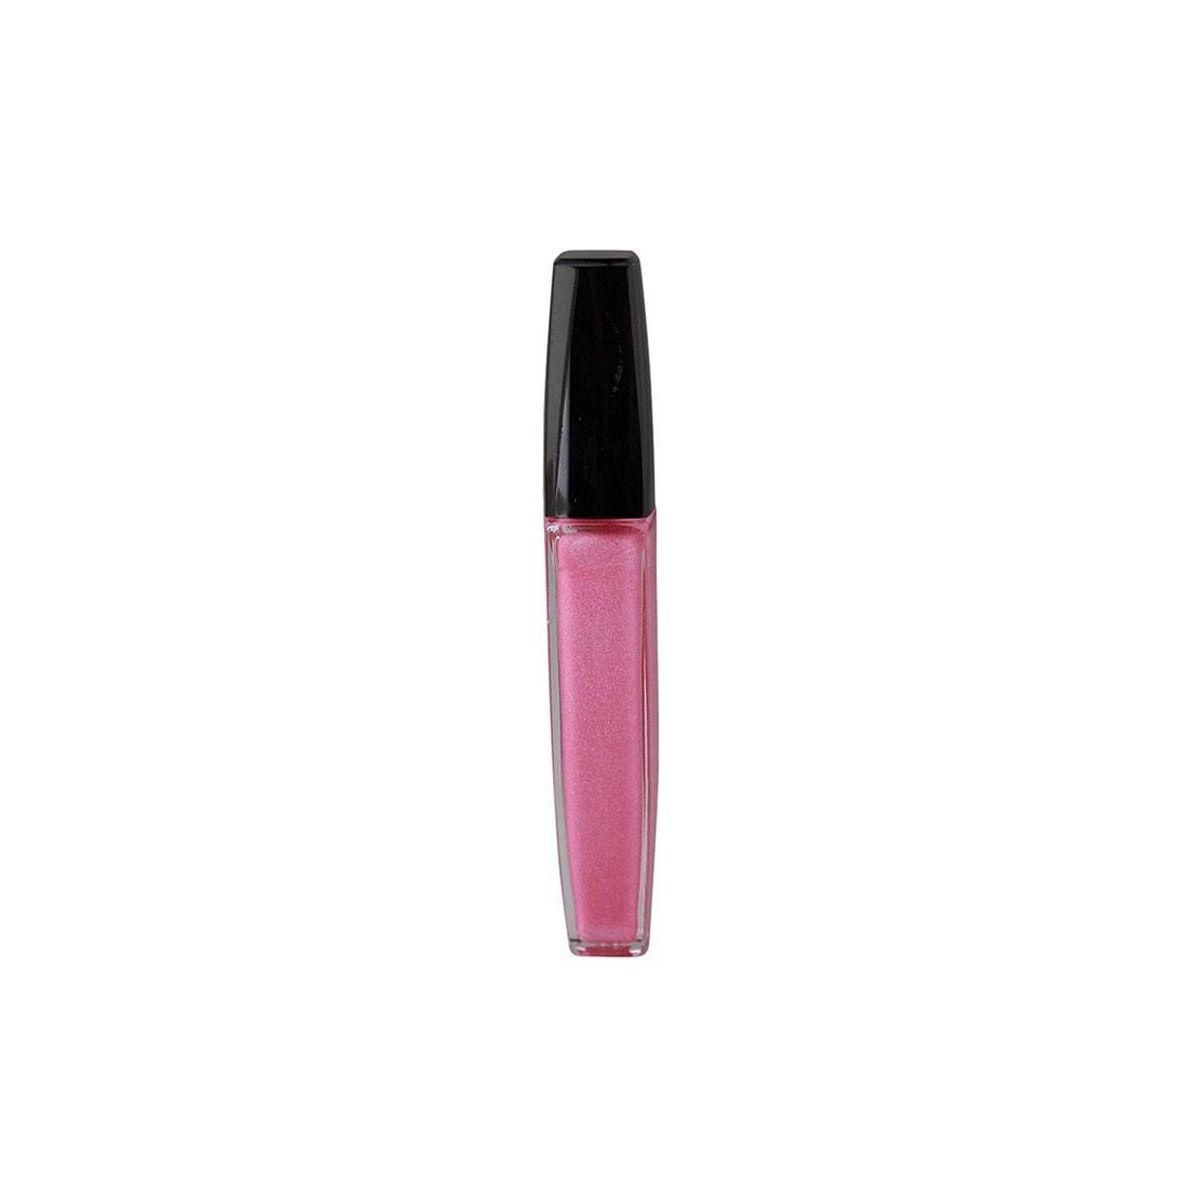 Juicy Lips Cool Pink